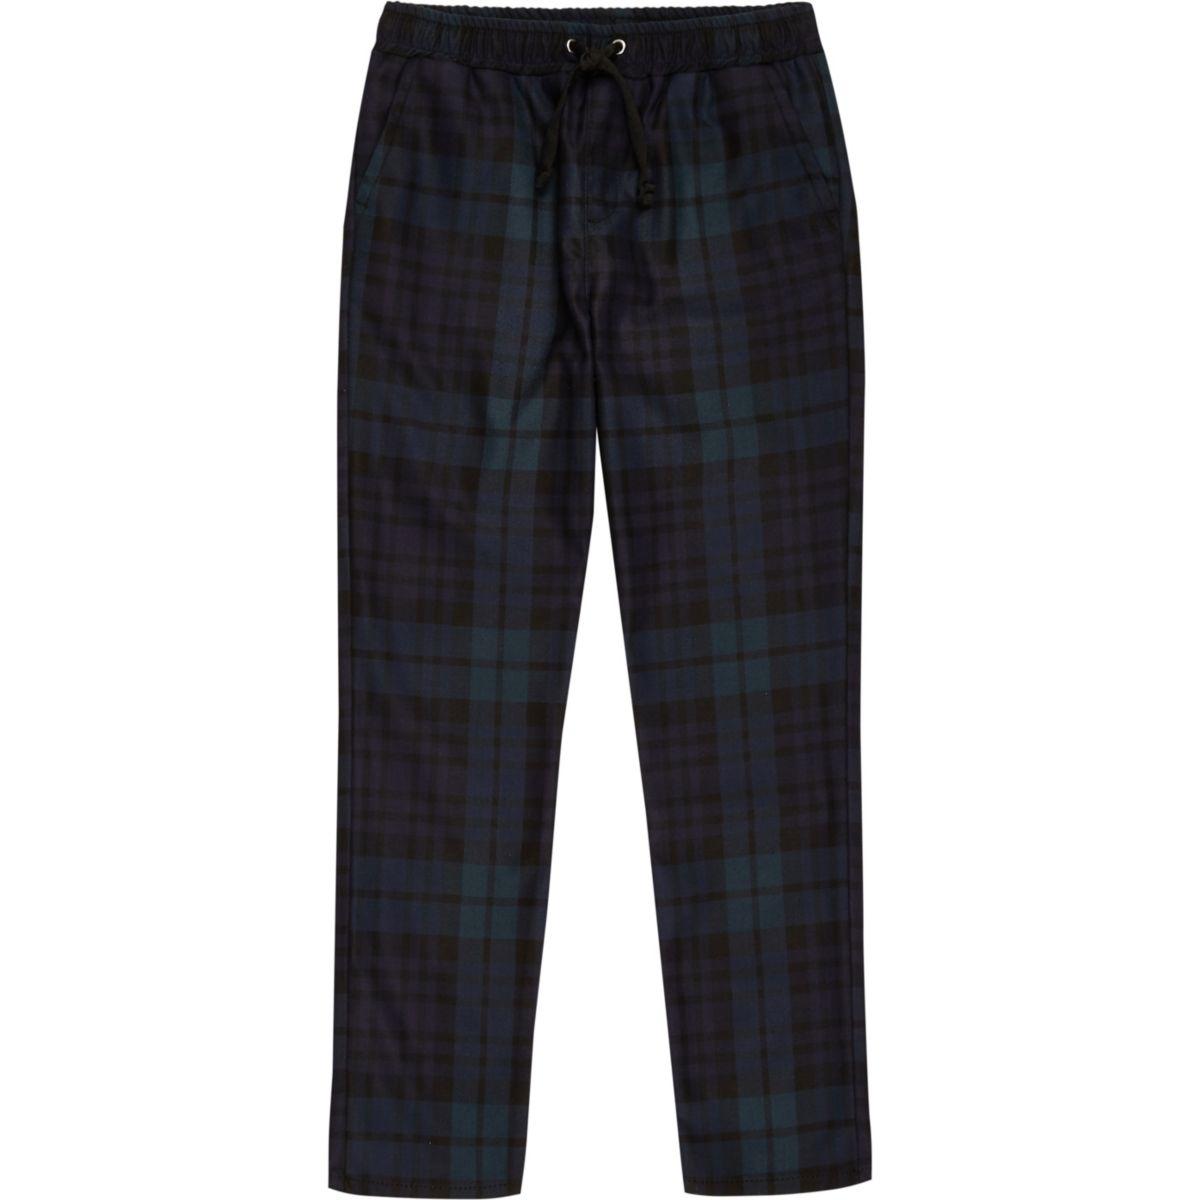 Boys navy plaid check pants